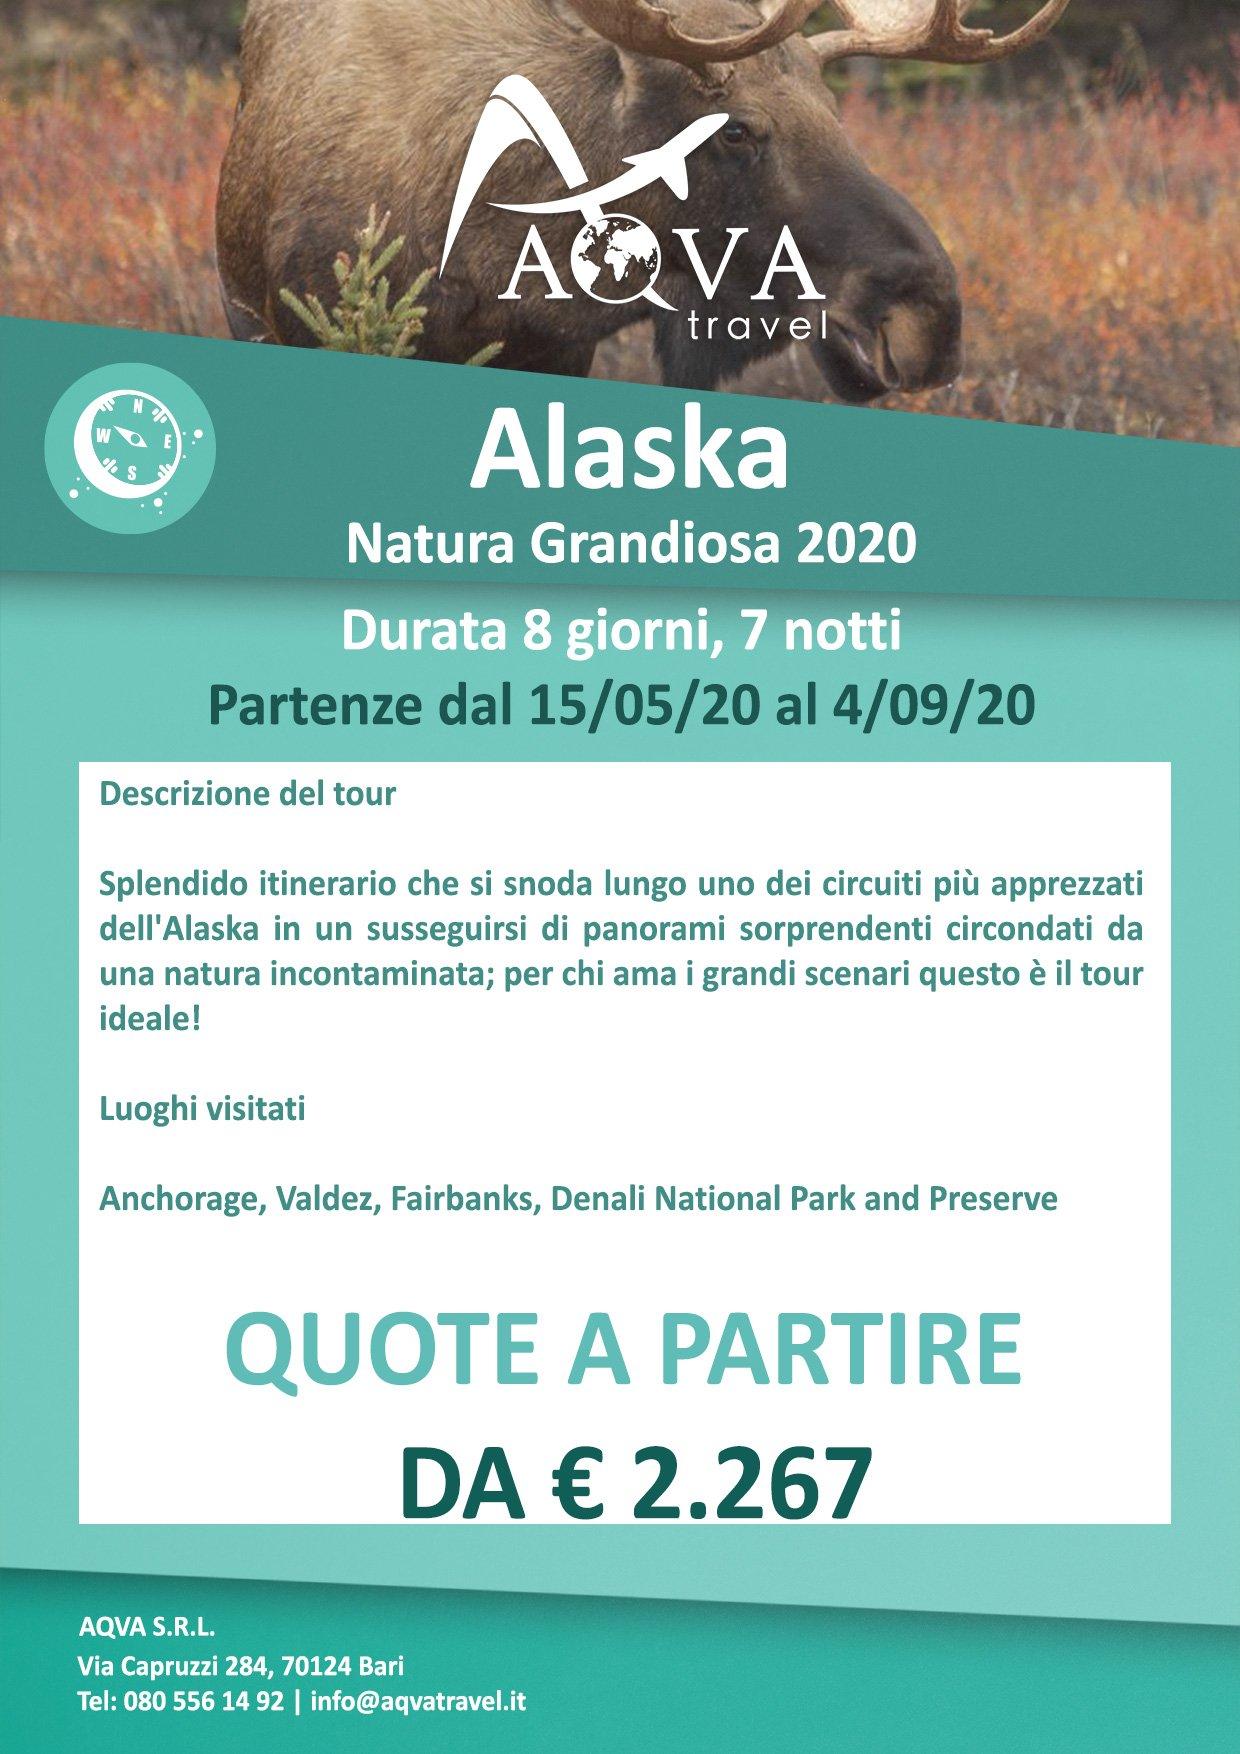 Alaska-Natura-Grandiosa-Avventura-offerte-agenzia-di-viaggi-Bari-AQVATRAVEL-it